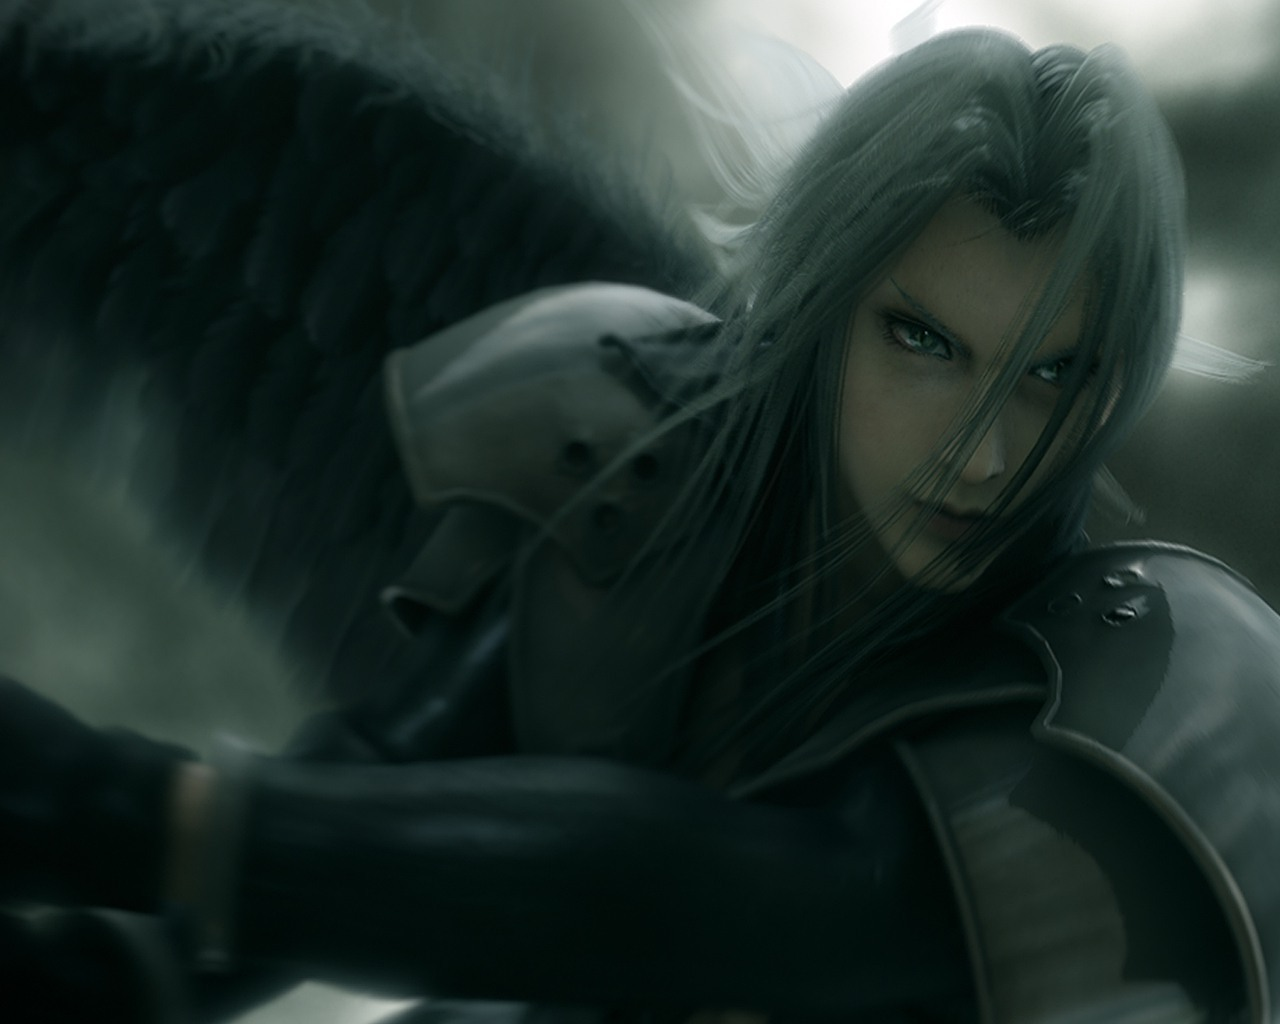 Sephiroth One winged angel  One Winged Angel Sephiroth